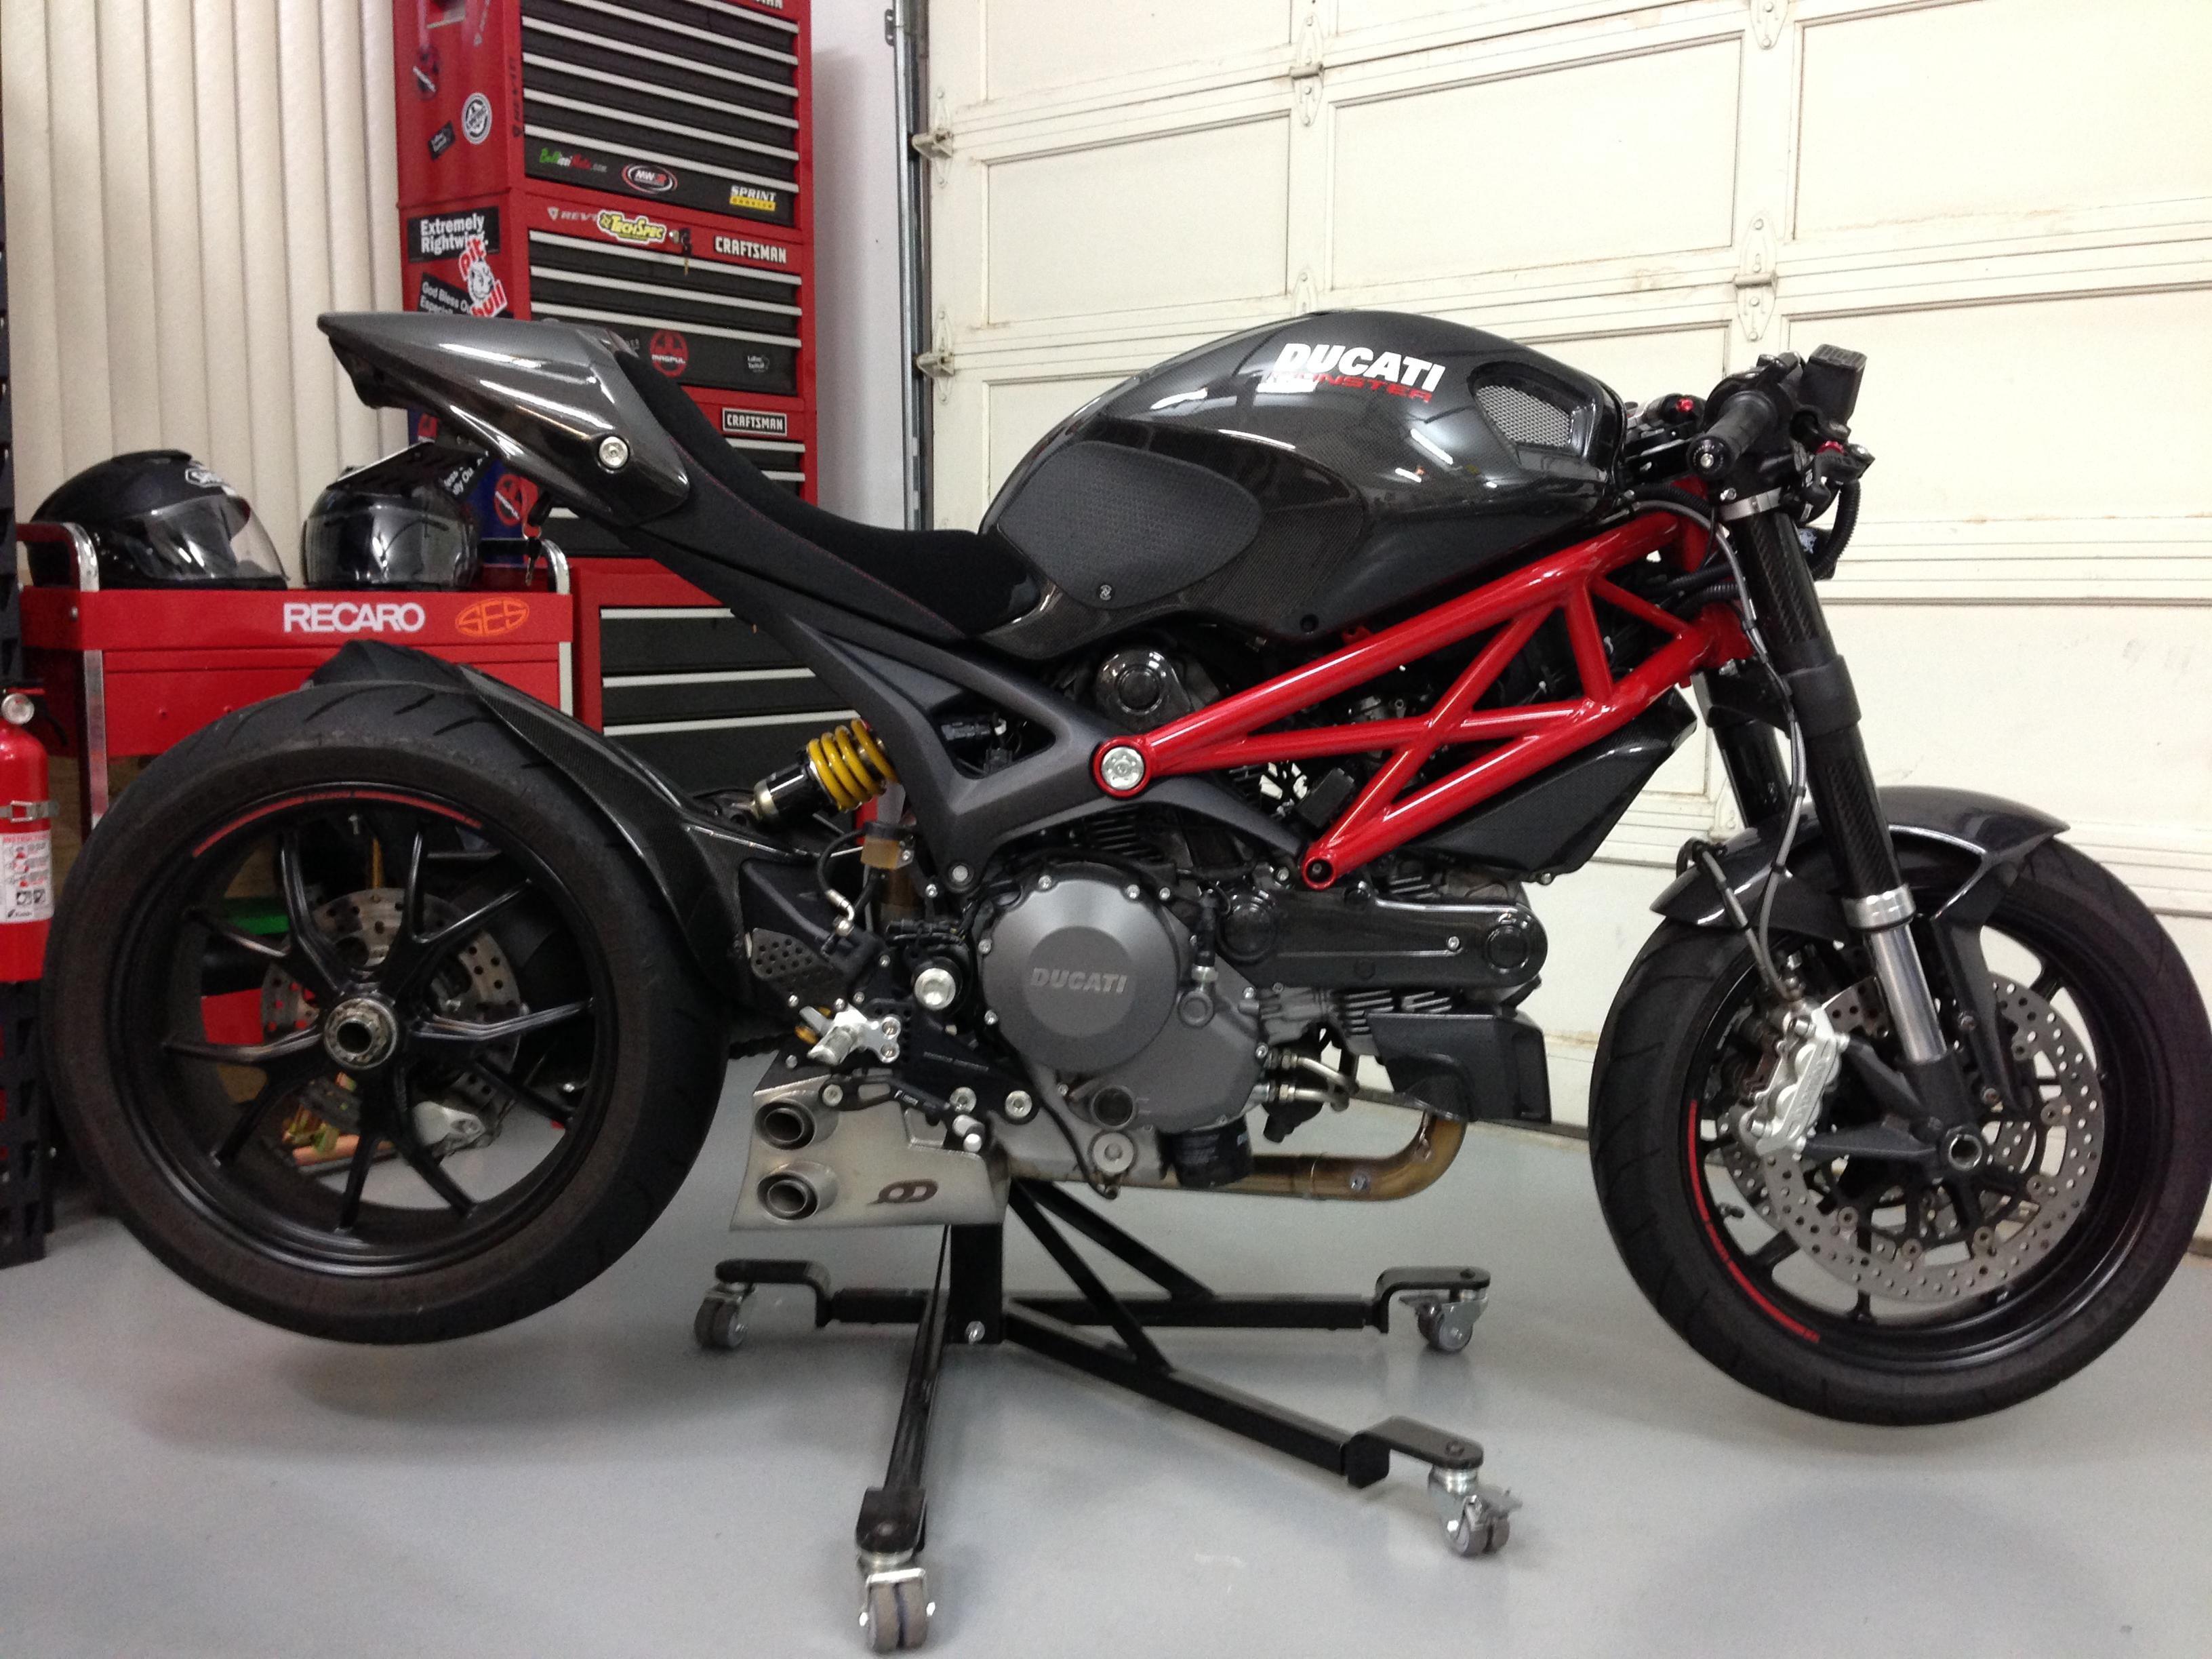 1100 evo exhaust motorcycles motos motocicletas carritos. Black Bedroom Furniture Sets. Home Design Ideas